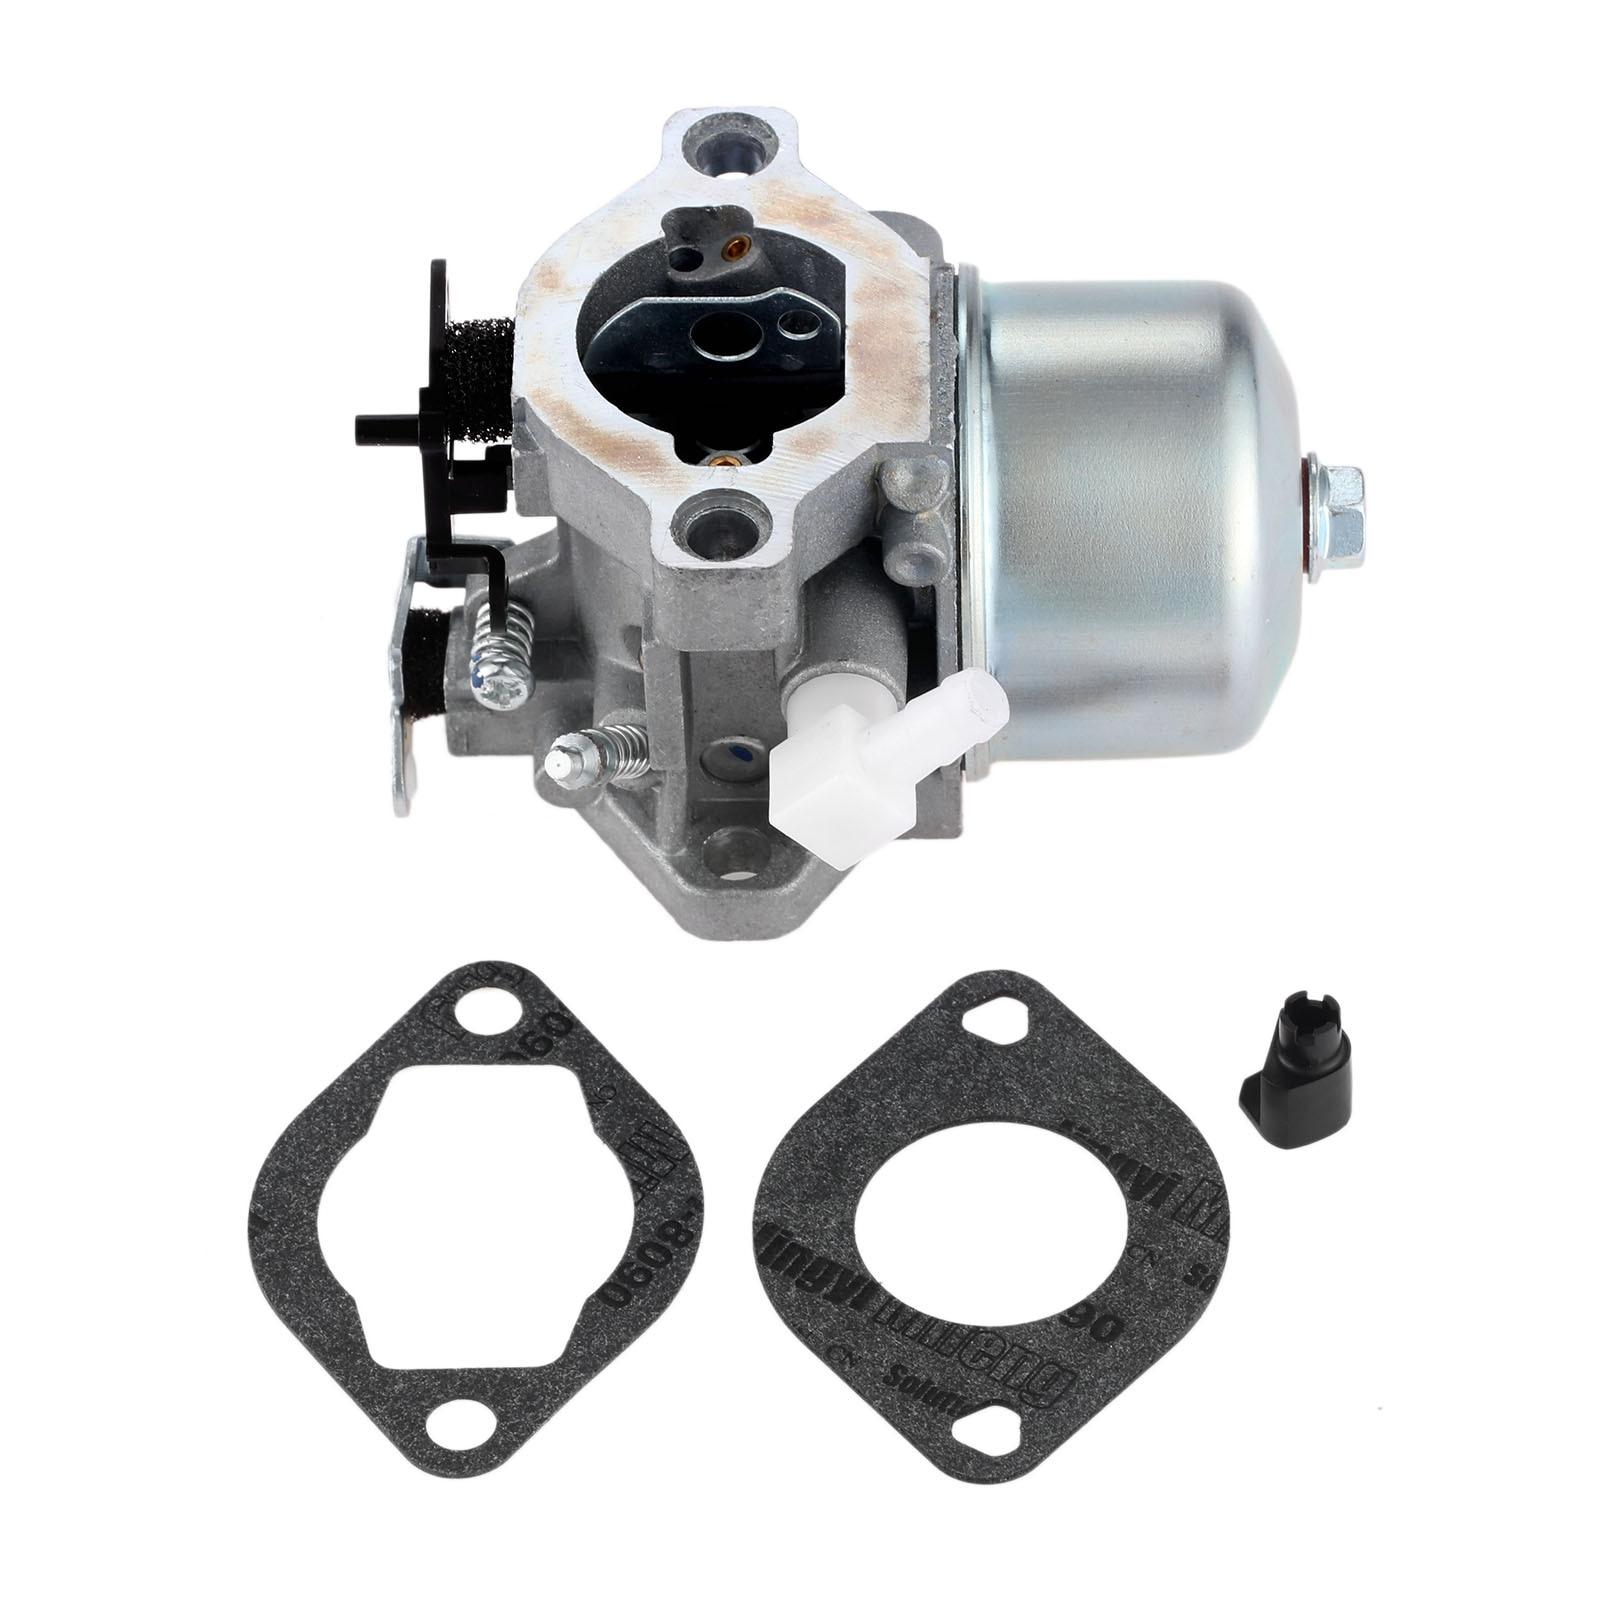 DRELD Replacement Carburetor With 2pcs Carburetor Gasket For Briggs & Stratton 699831 Carb Lawn Mower Garden Power Tools